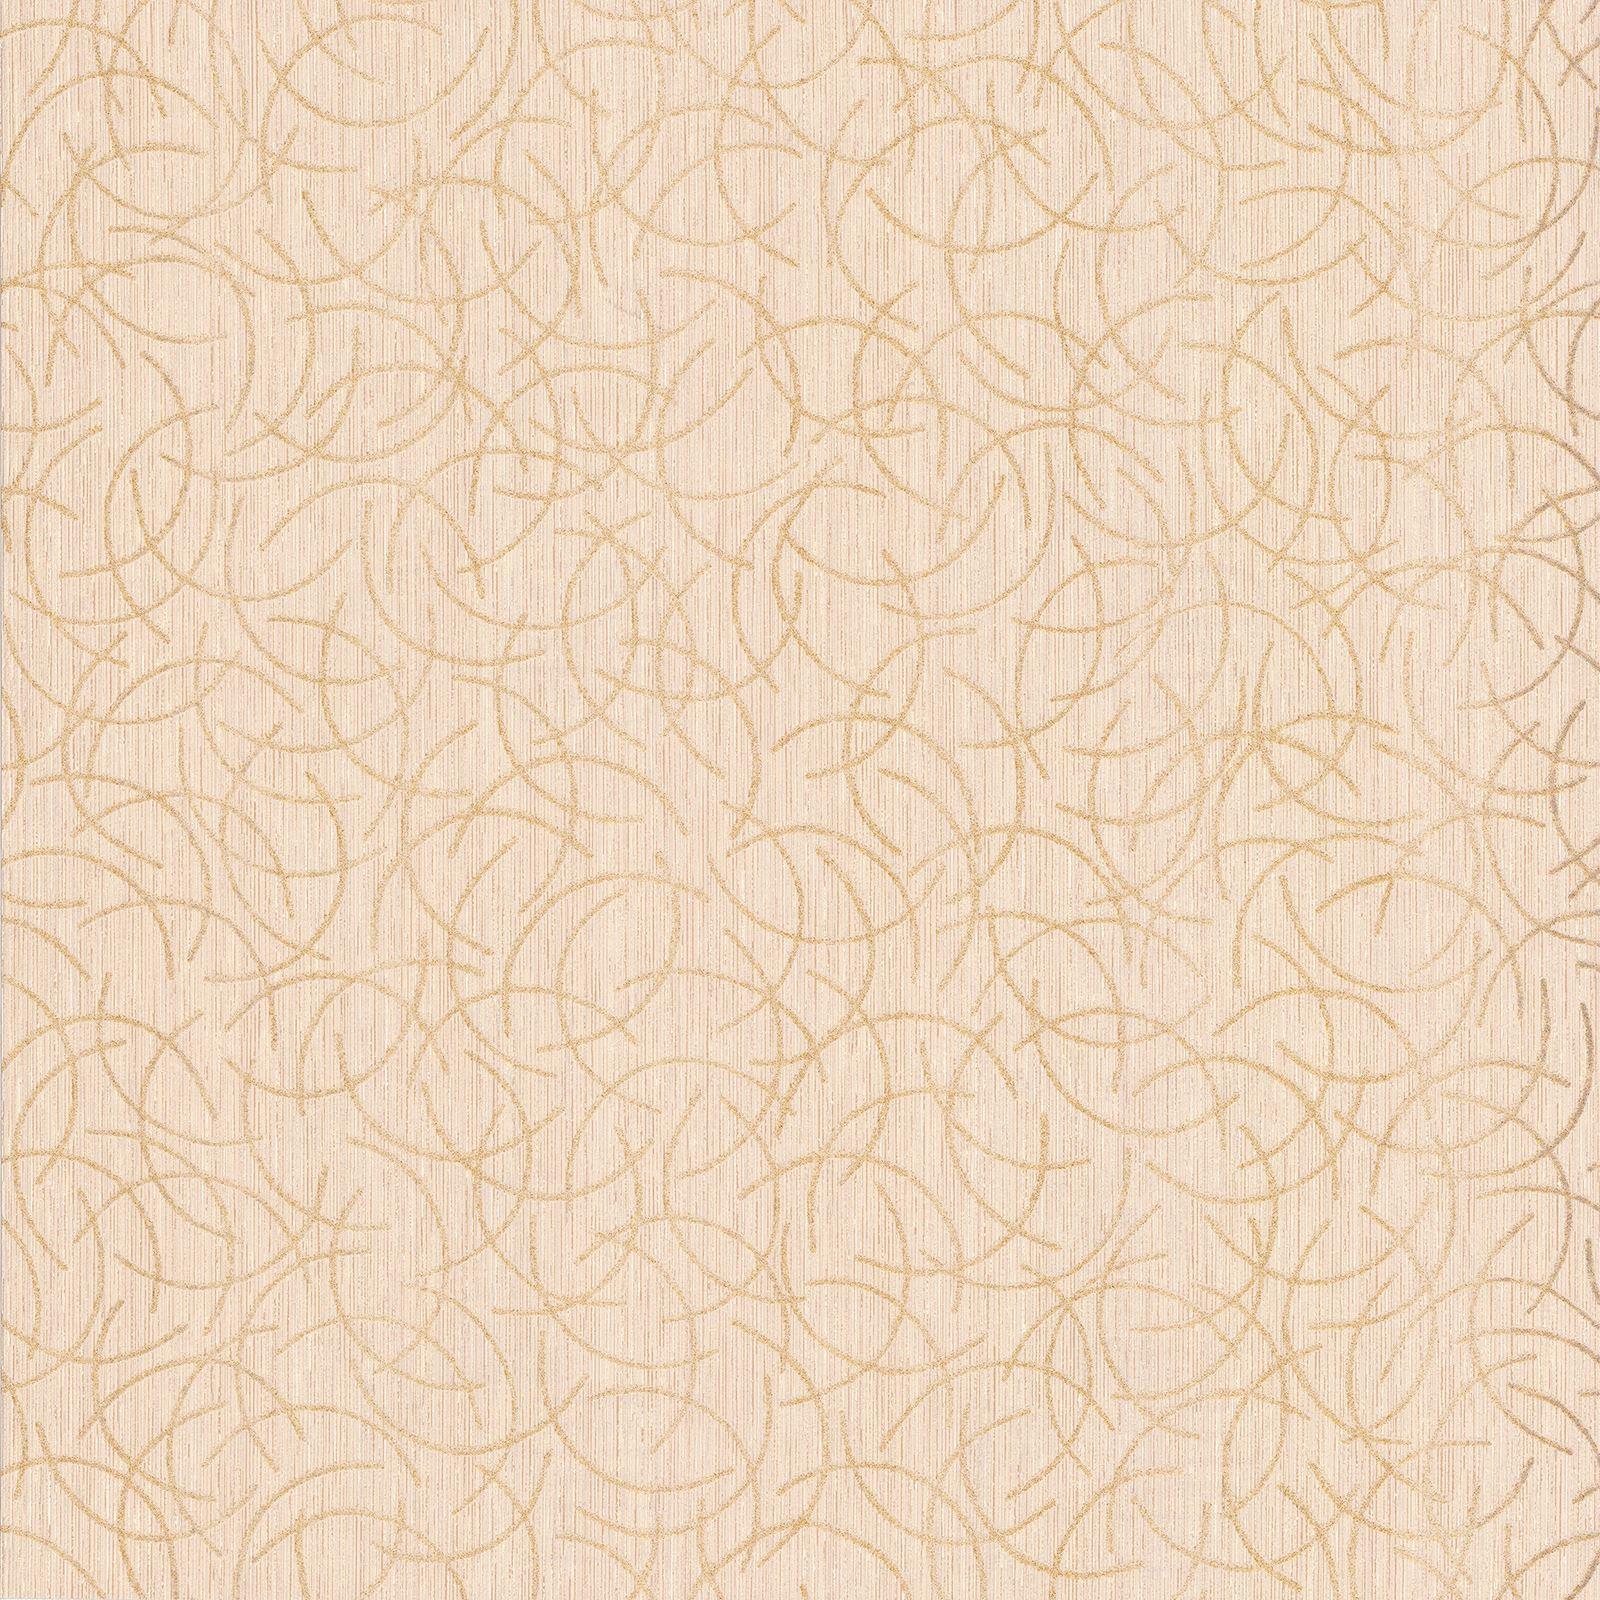 geometrisch glitzer motiv tapete creme gold p s 13527 50. Black Bedroom Furniture Sets. Home Design Ideas